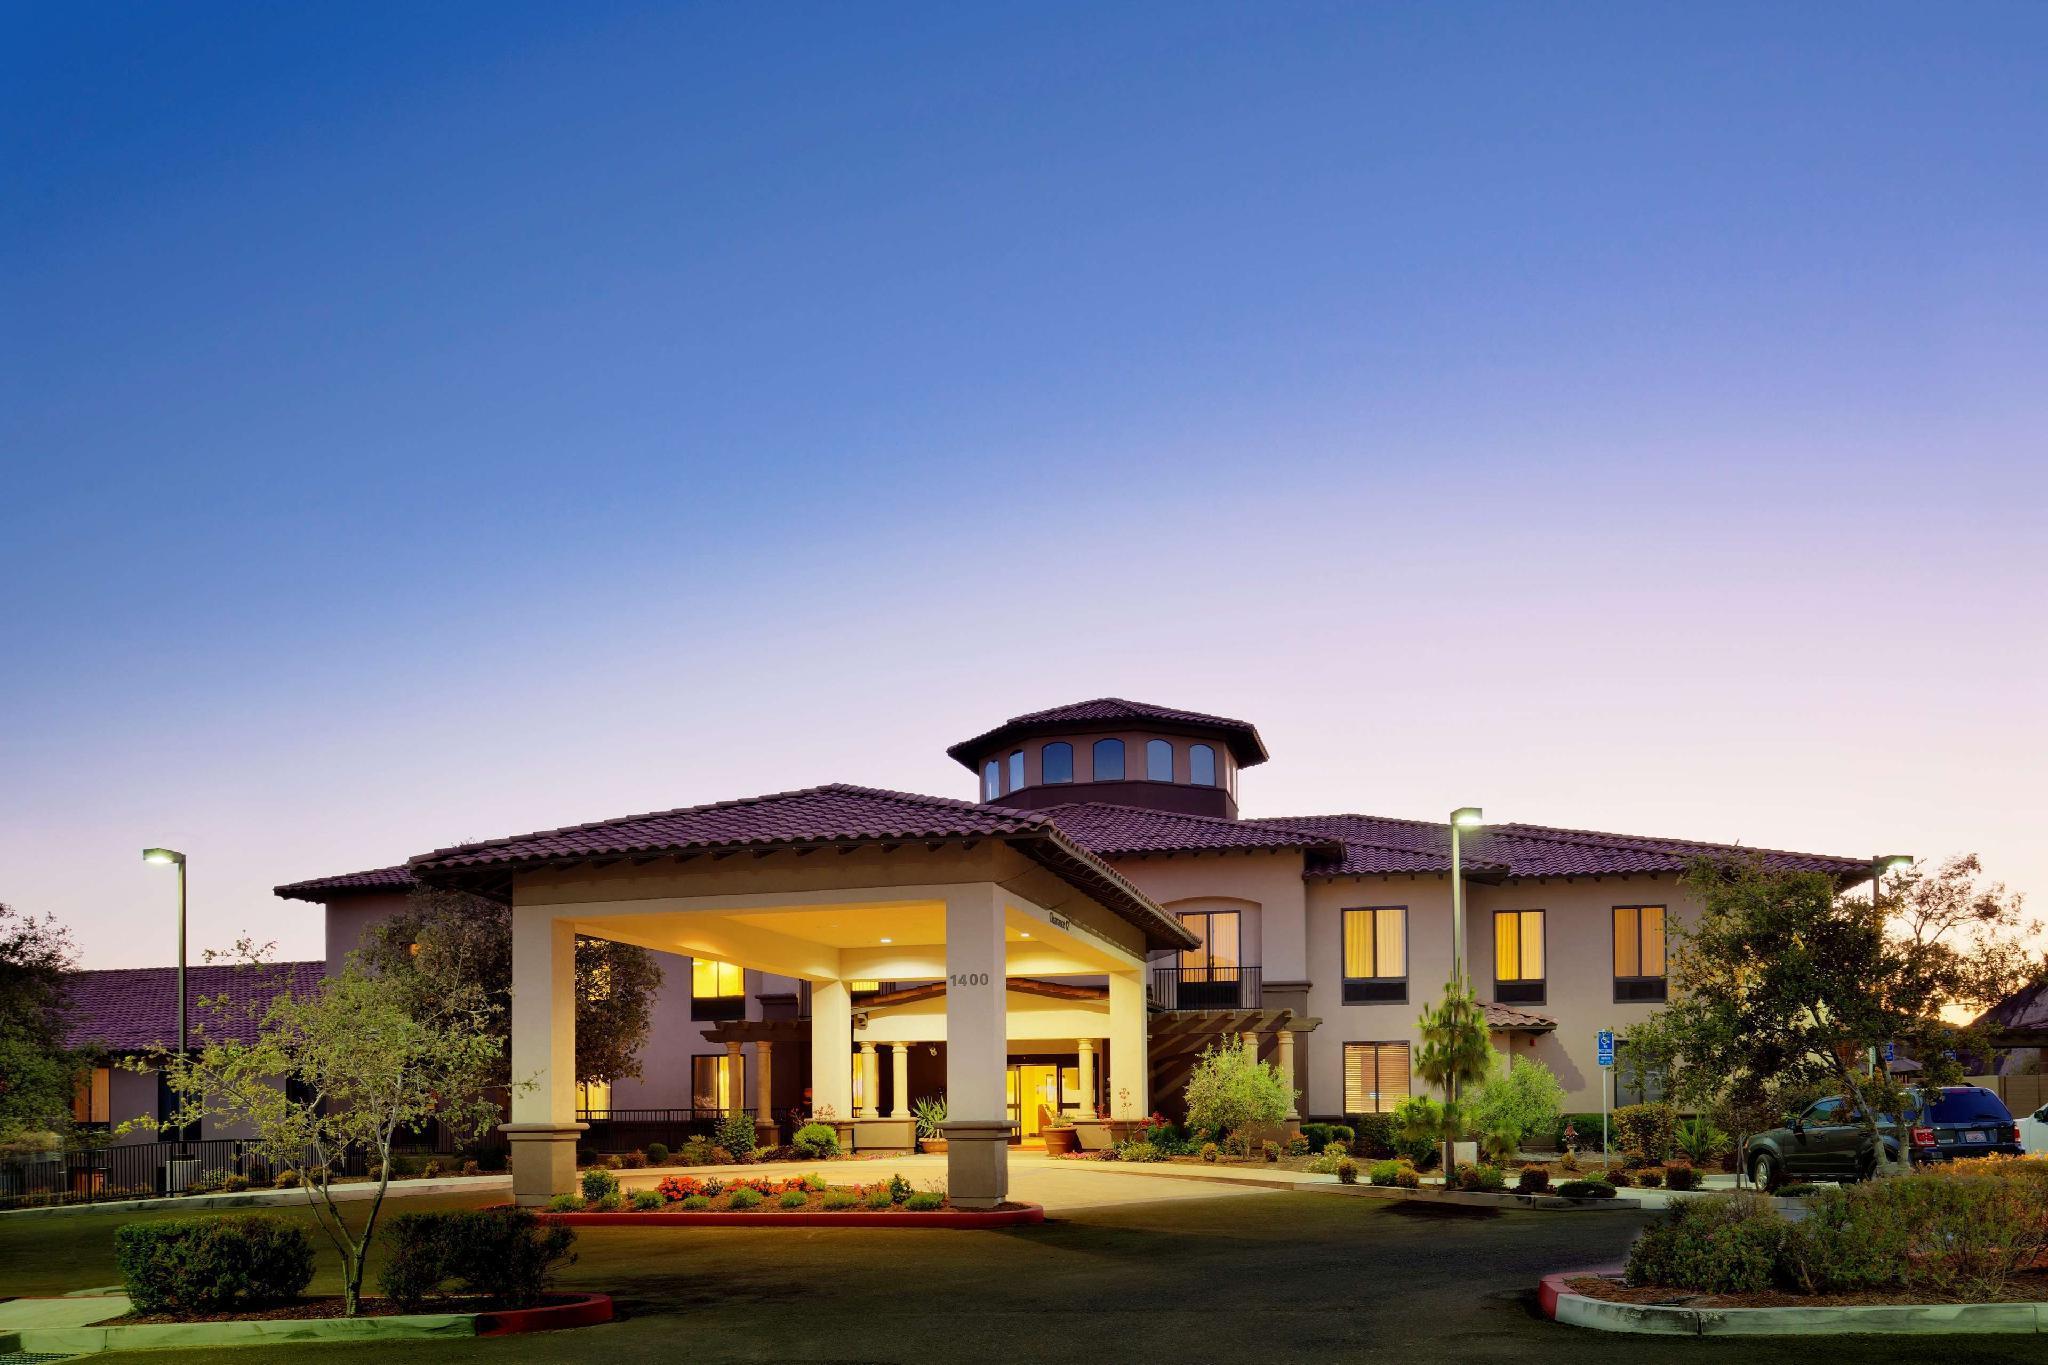 Hampton Inn And Suites Arroyo Grande Pismo Beach Area